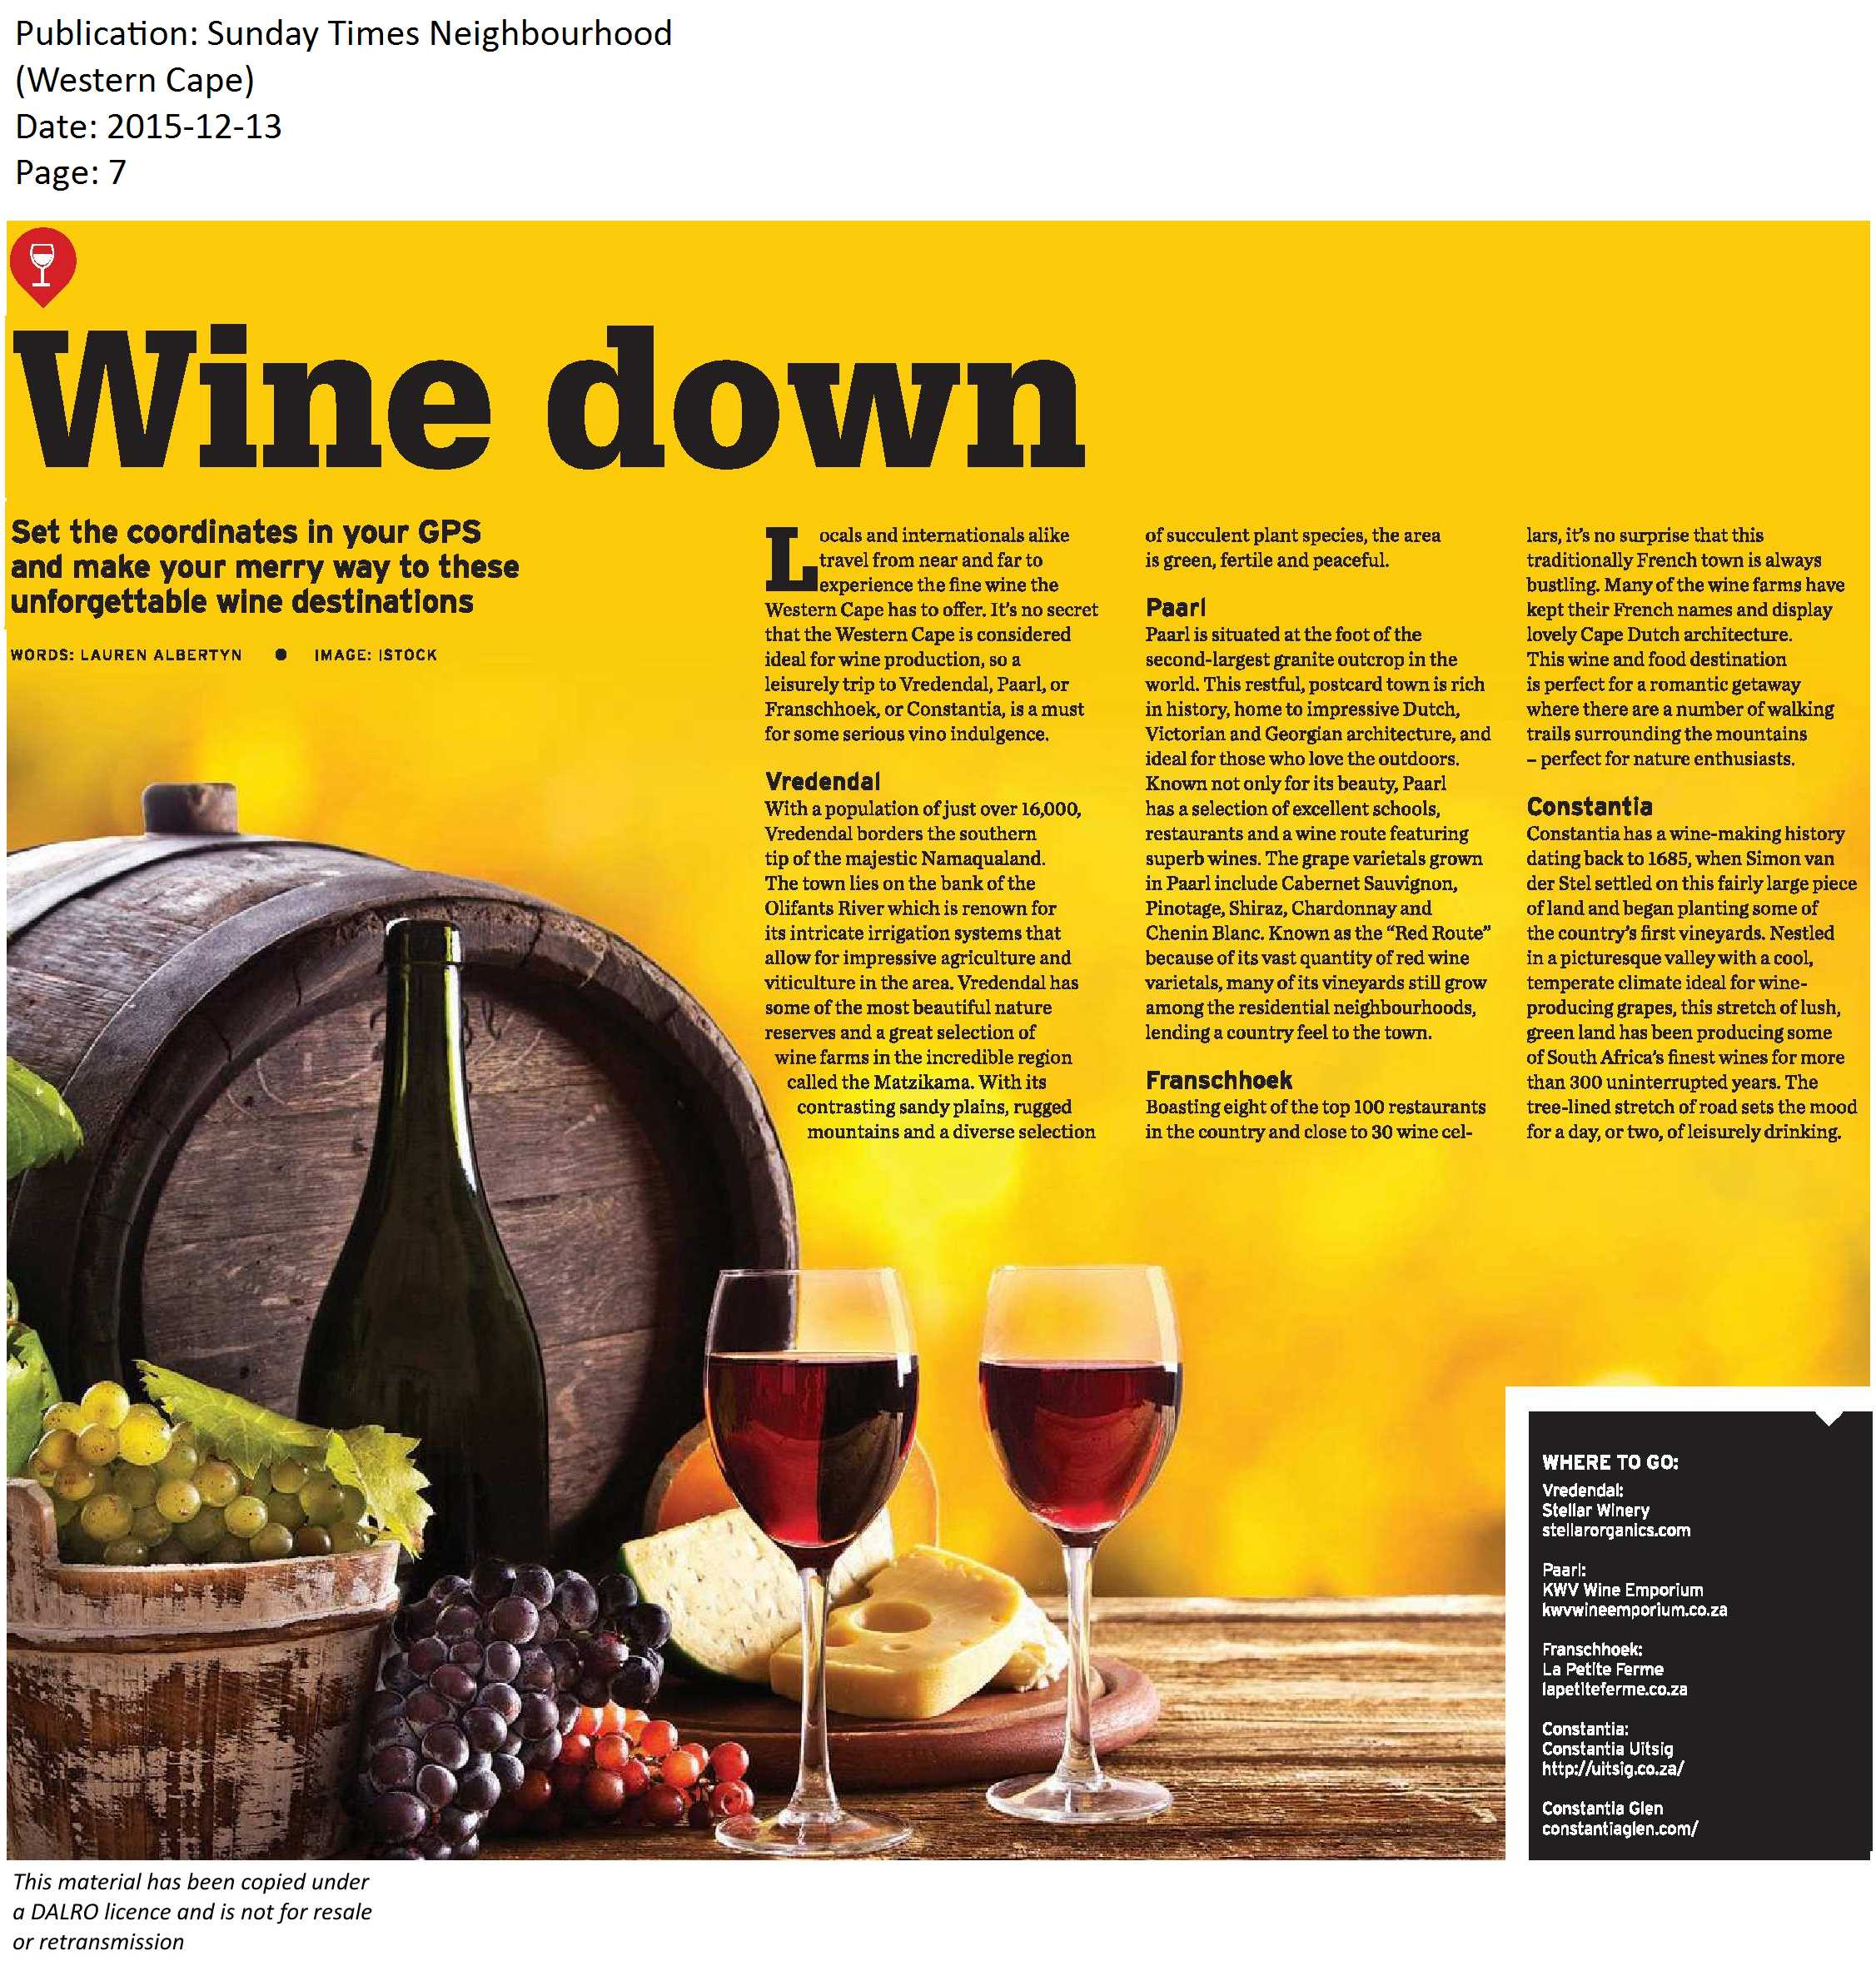 Sunday Times Neighbourhood -